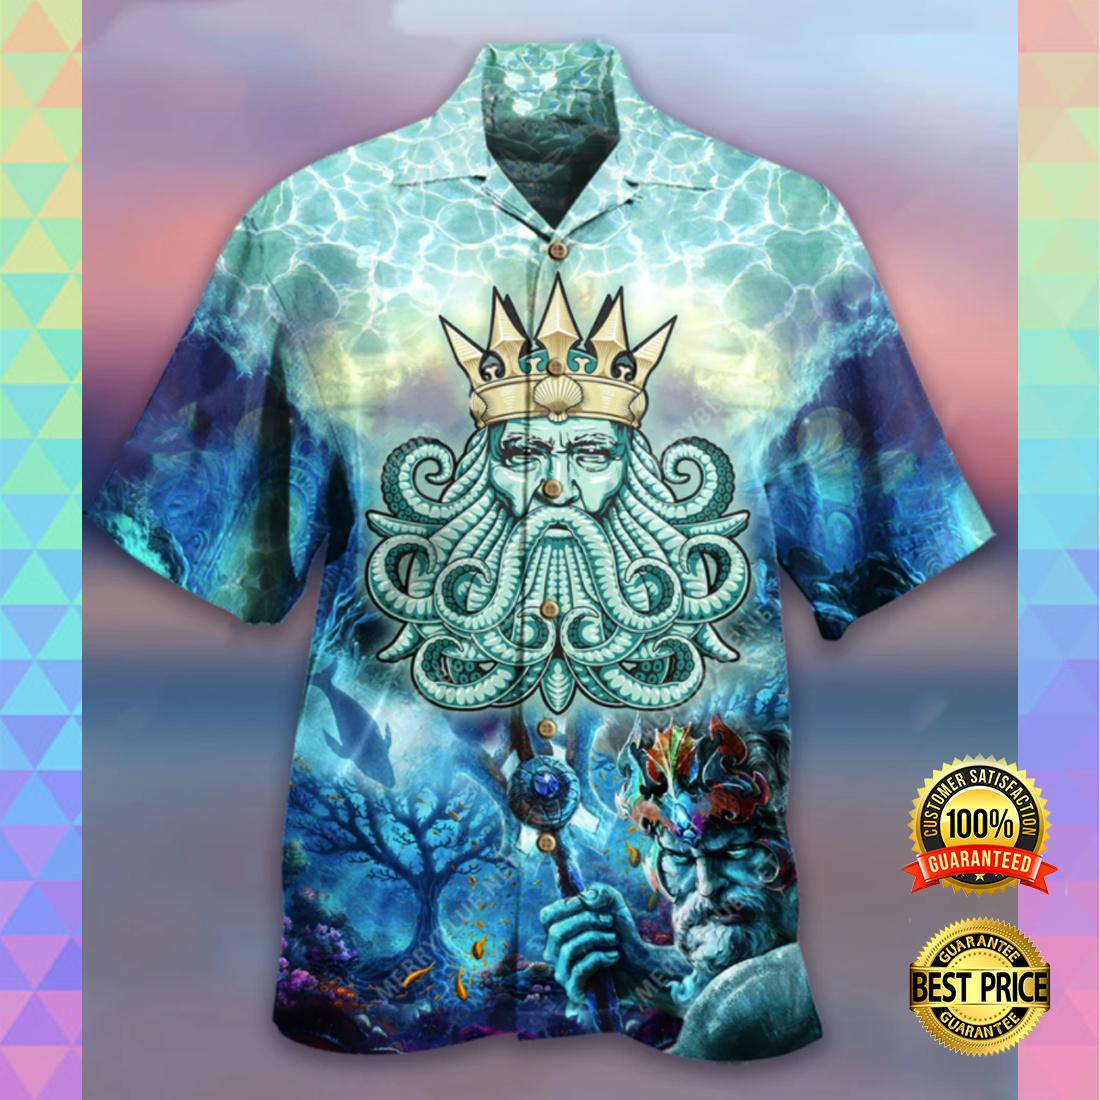 Poseidon hawaiian shirt 4